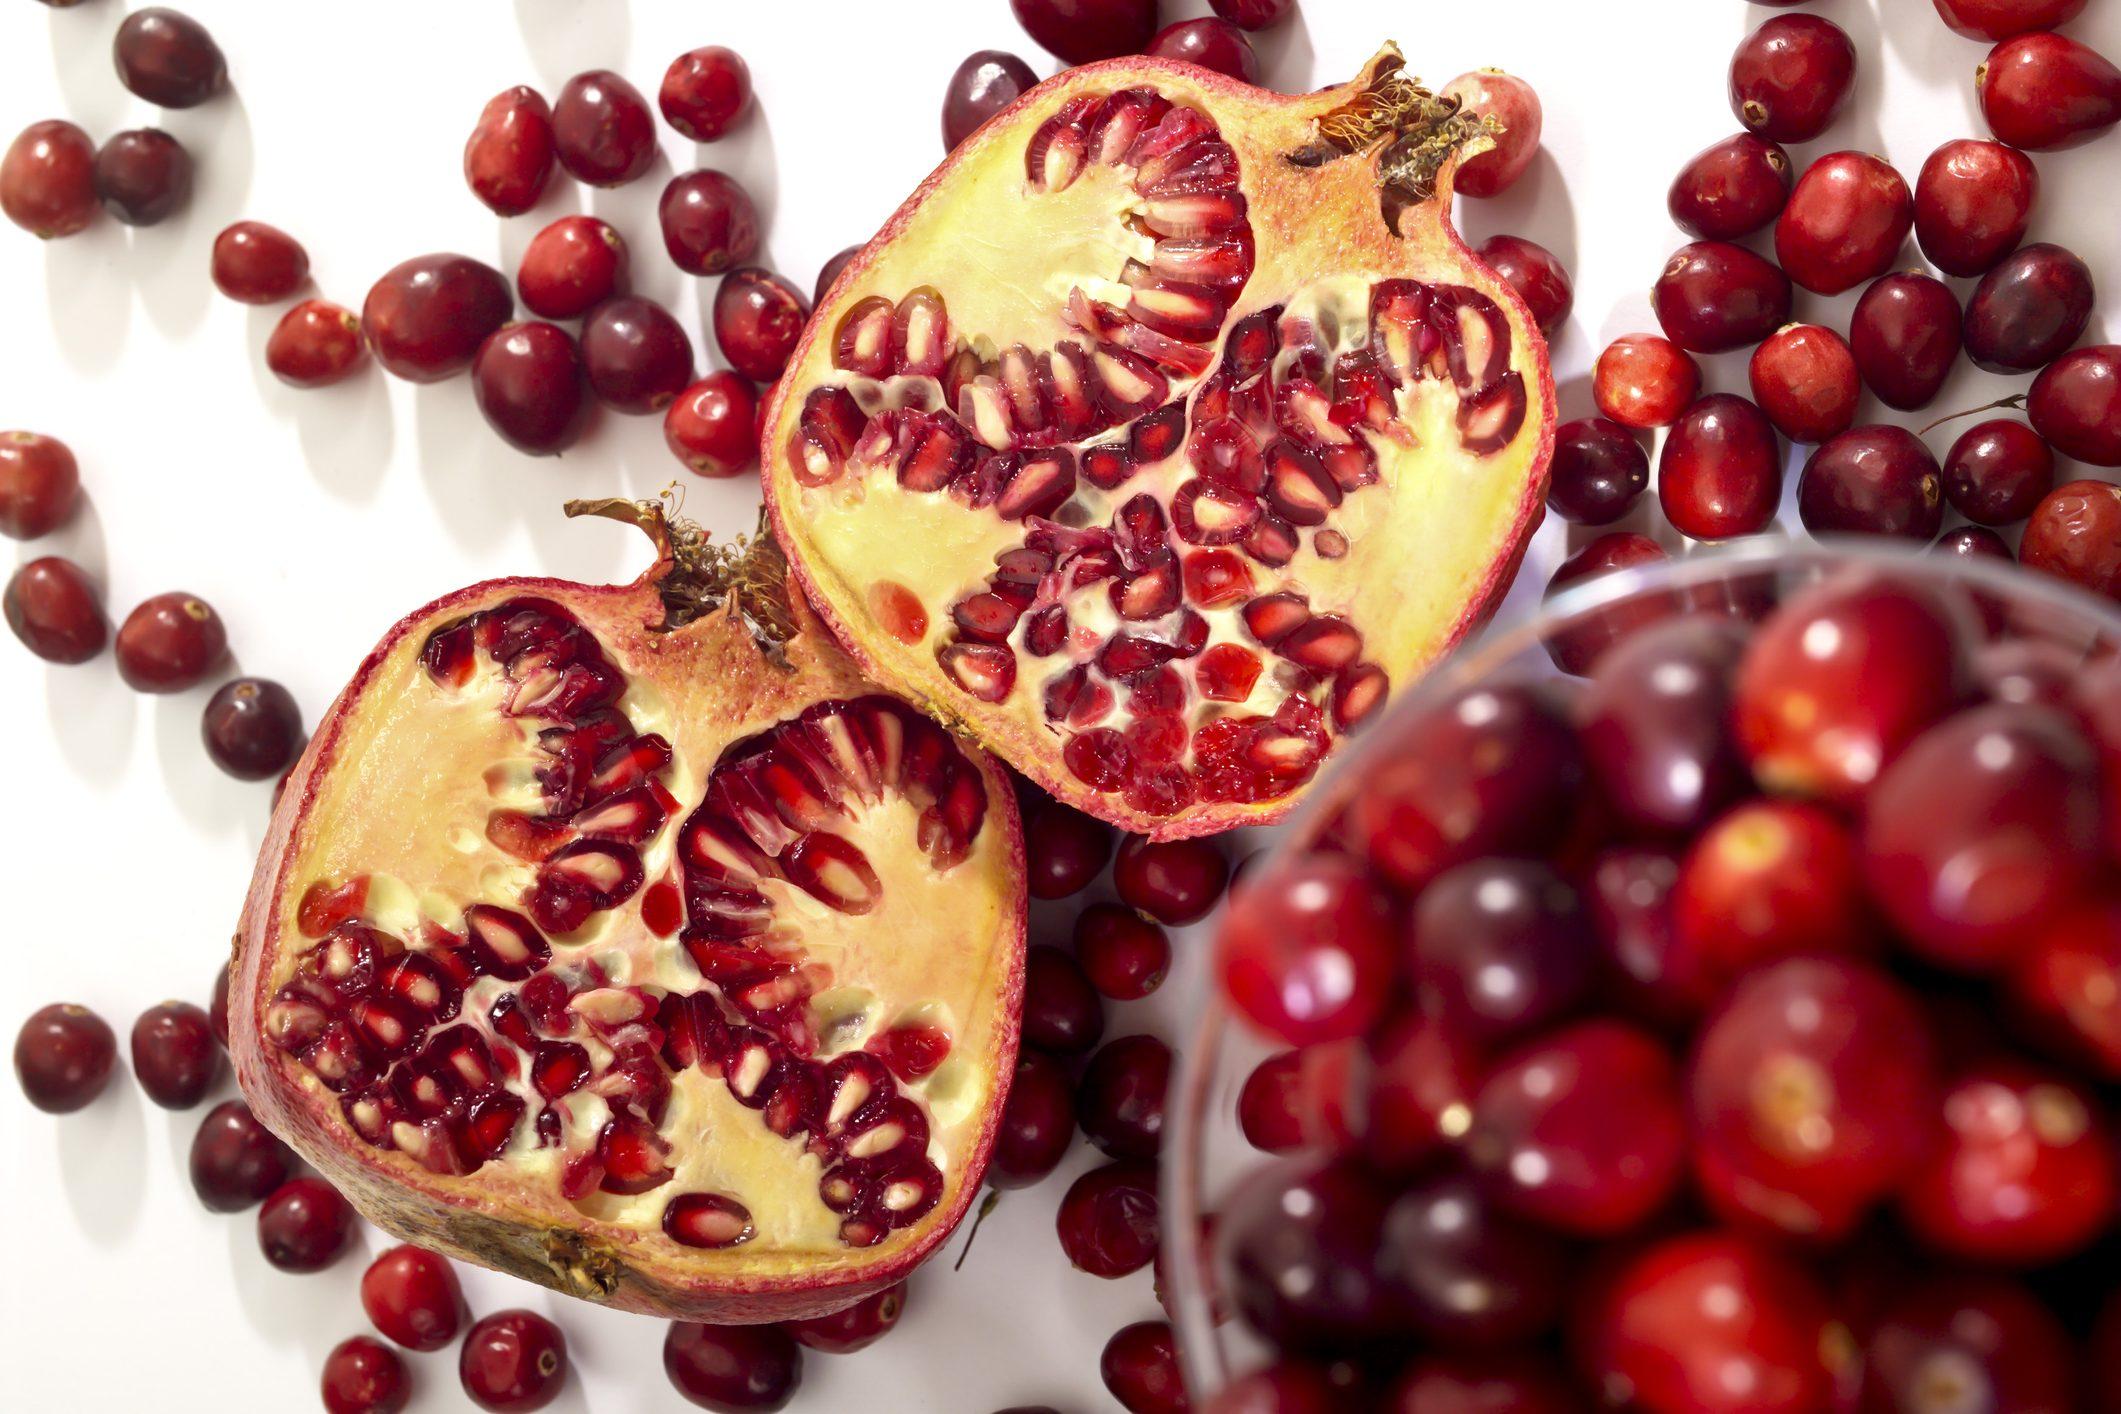 Pomegranates and cranberries